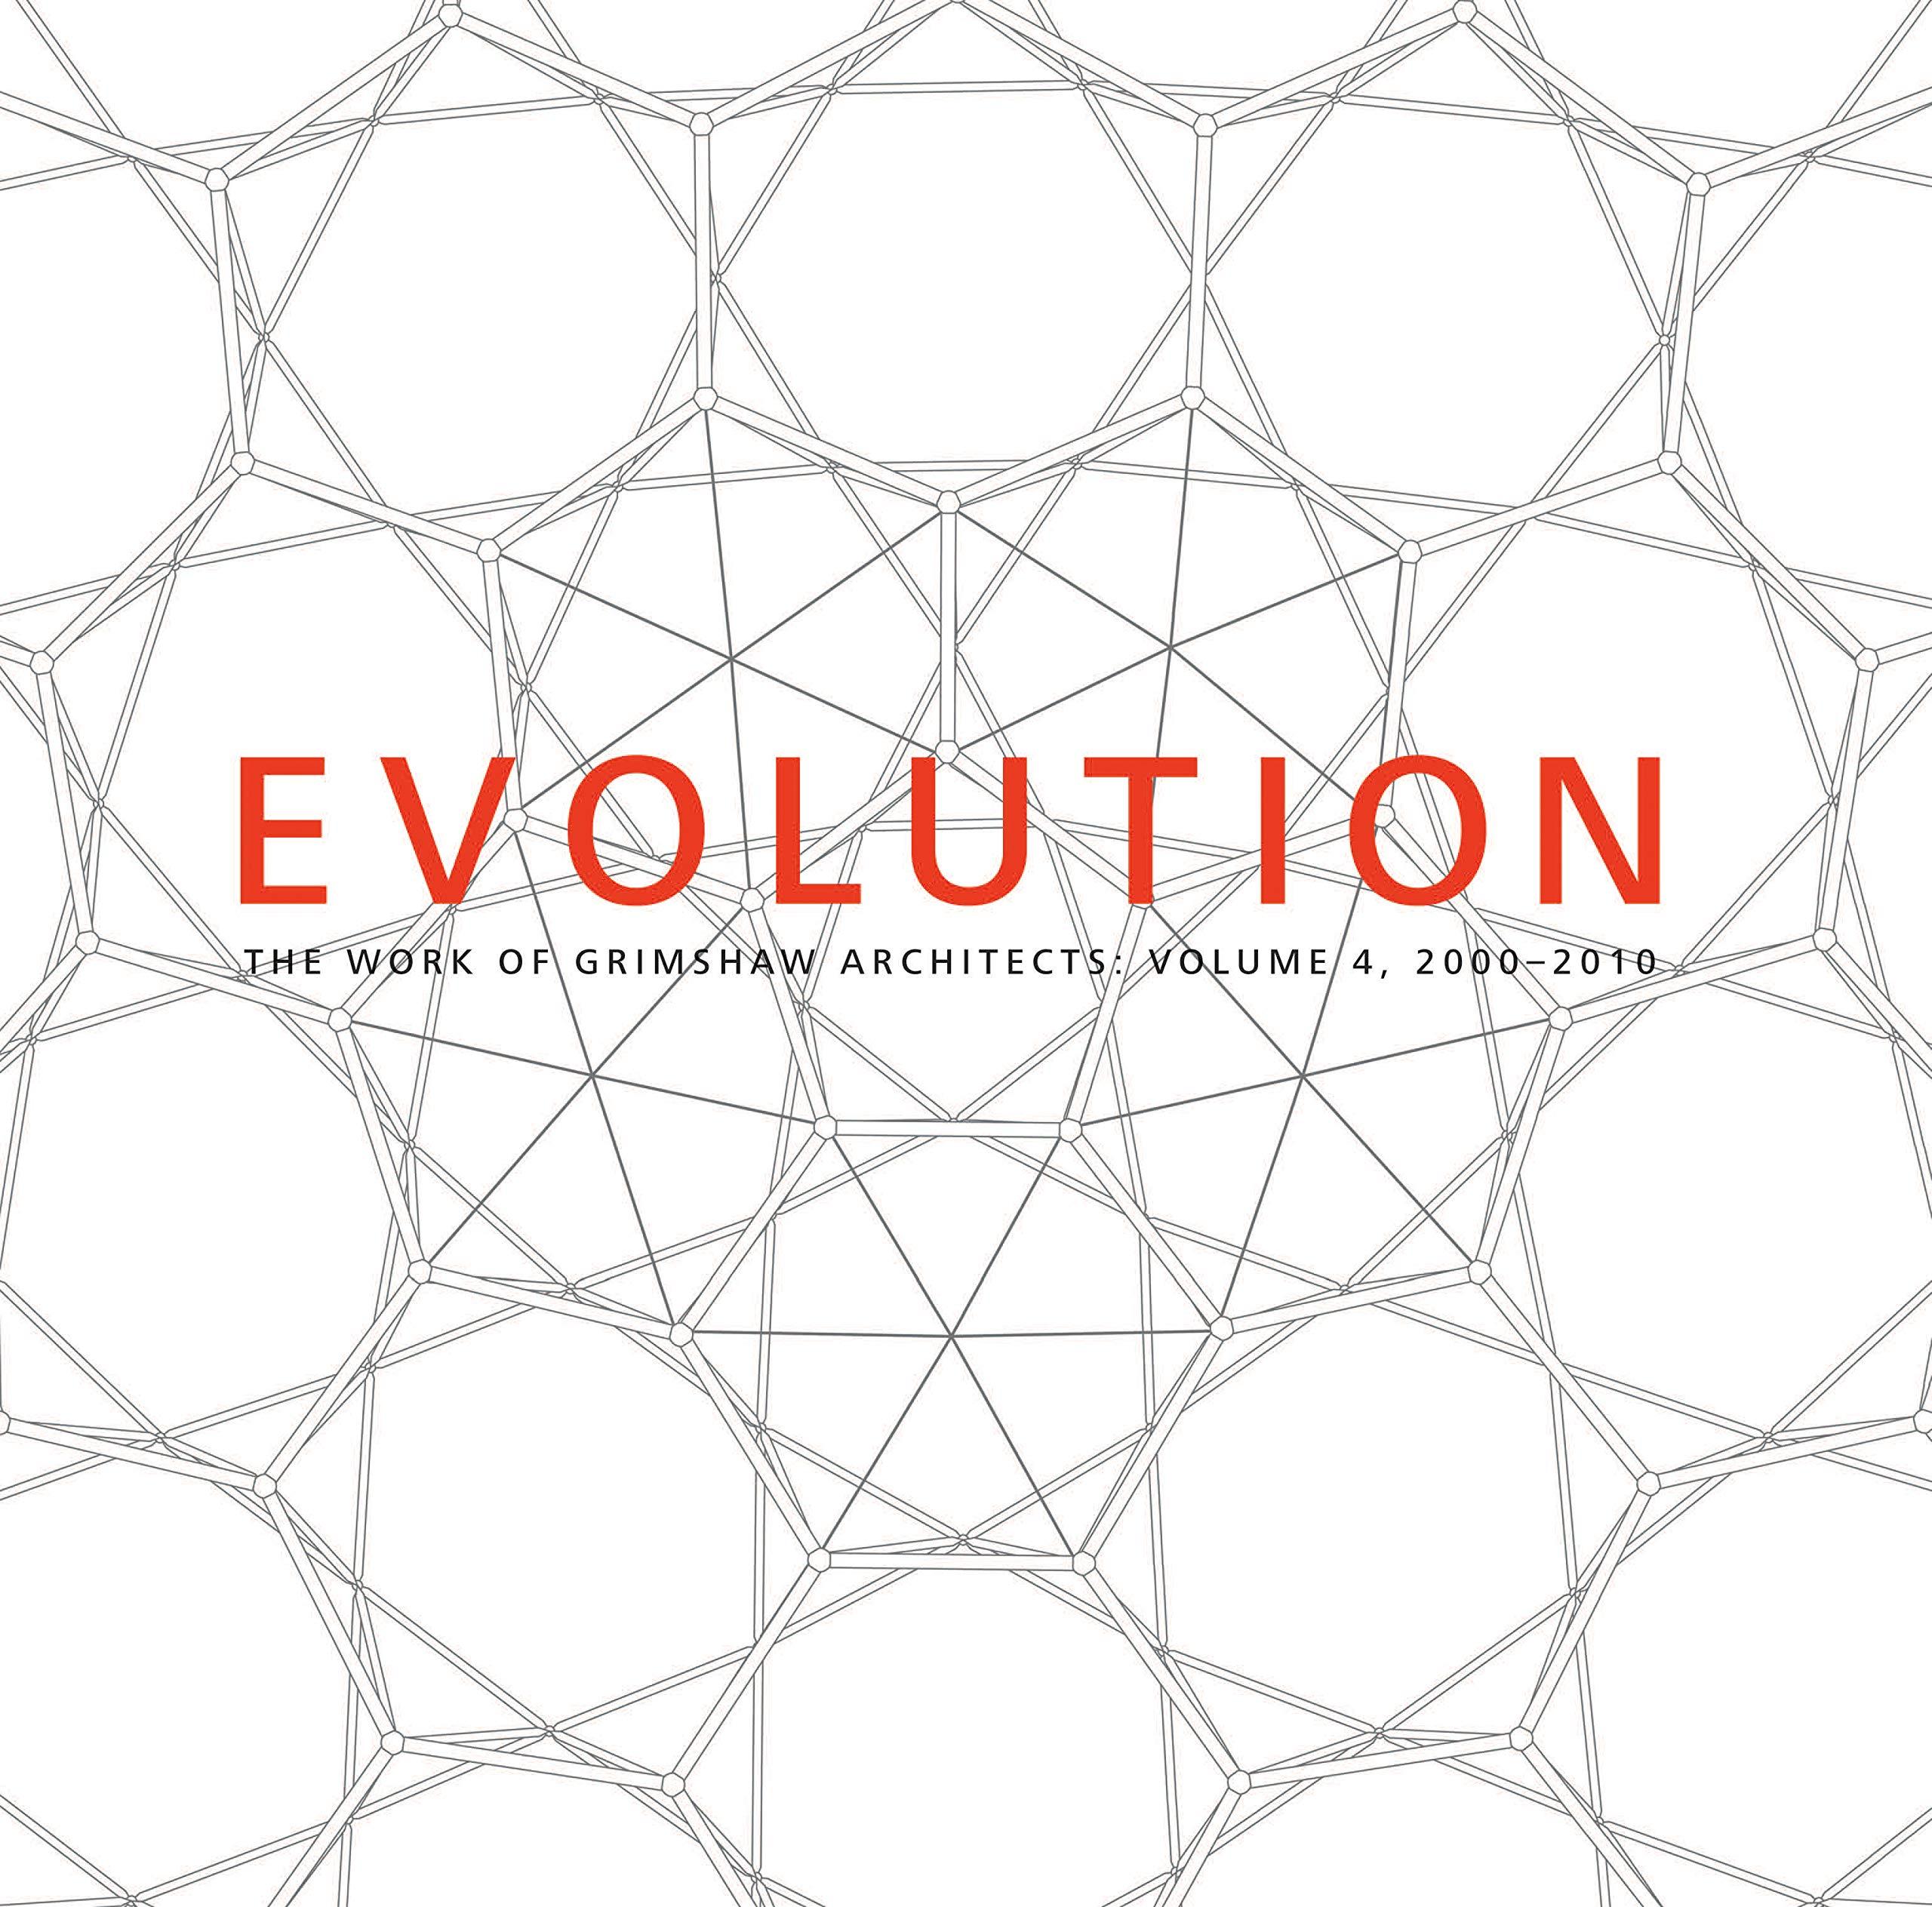 Evolution: The Work of Grimshaw Architects, vol 4 2000-2010